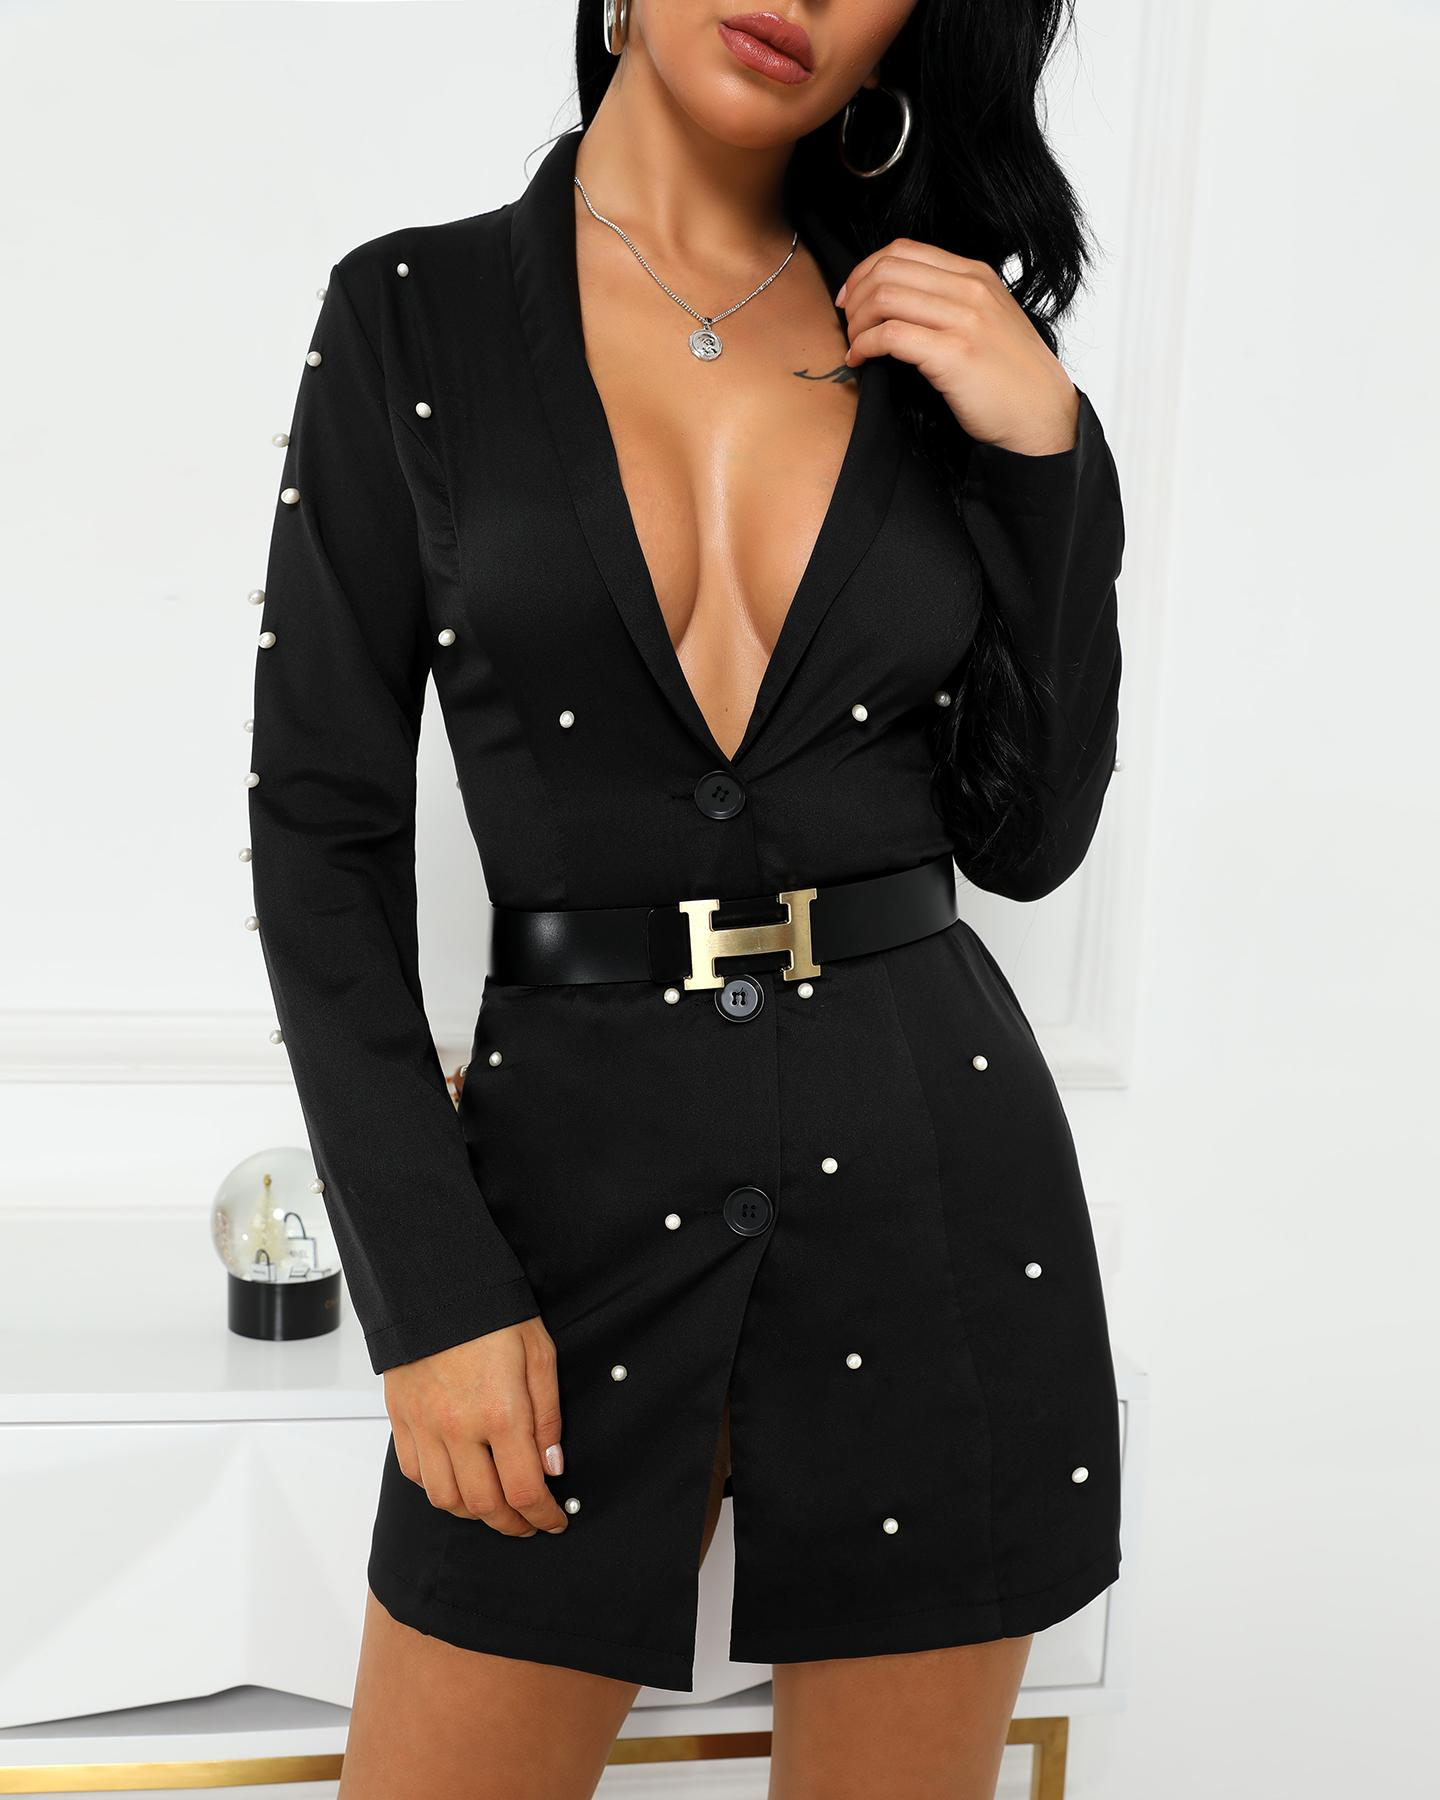 boutiquefeel / Vestido de trabalho embelezado